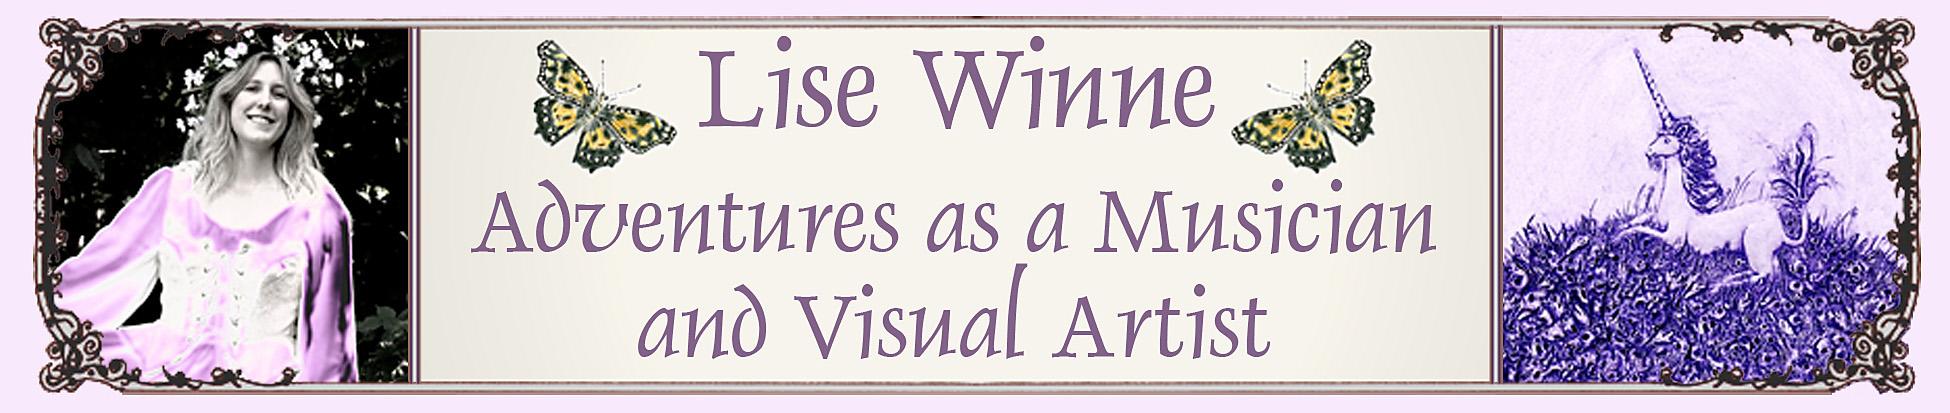 Lise Winne, adventures as a musician and artist